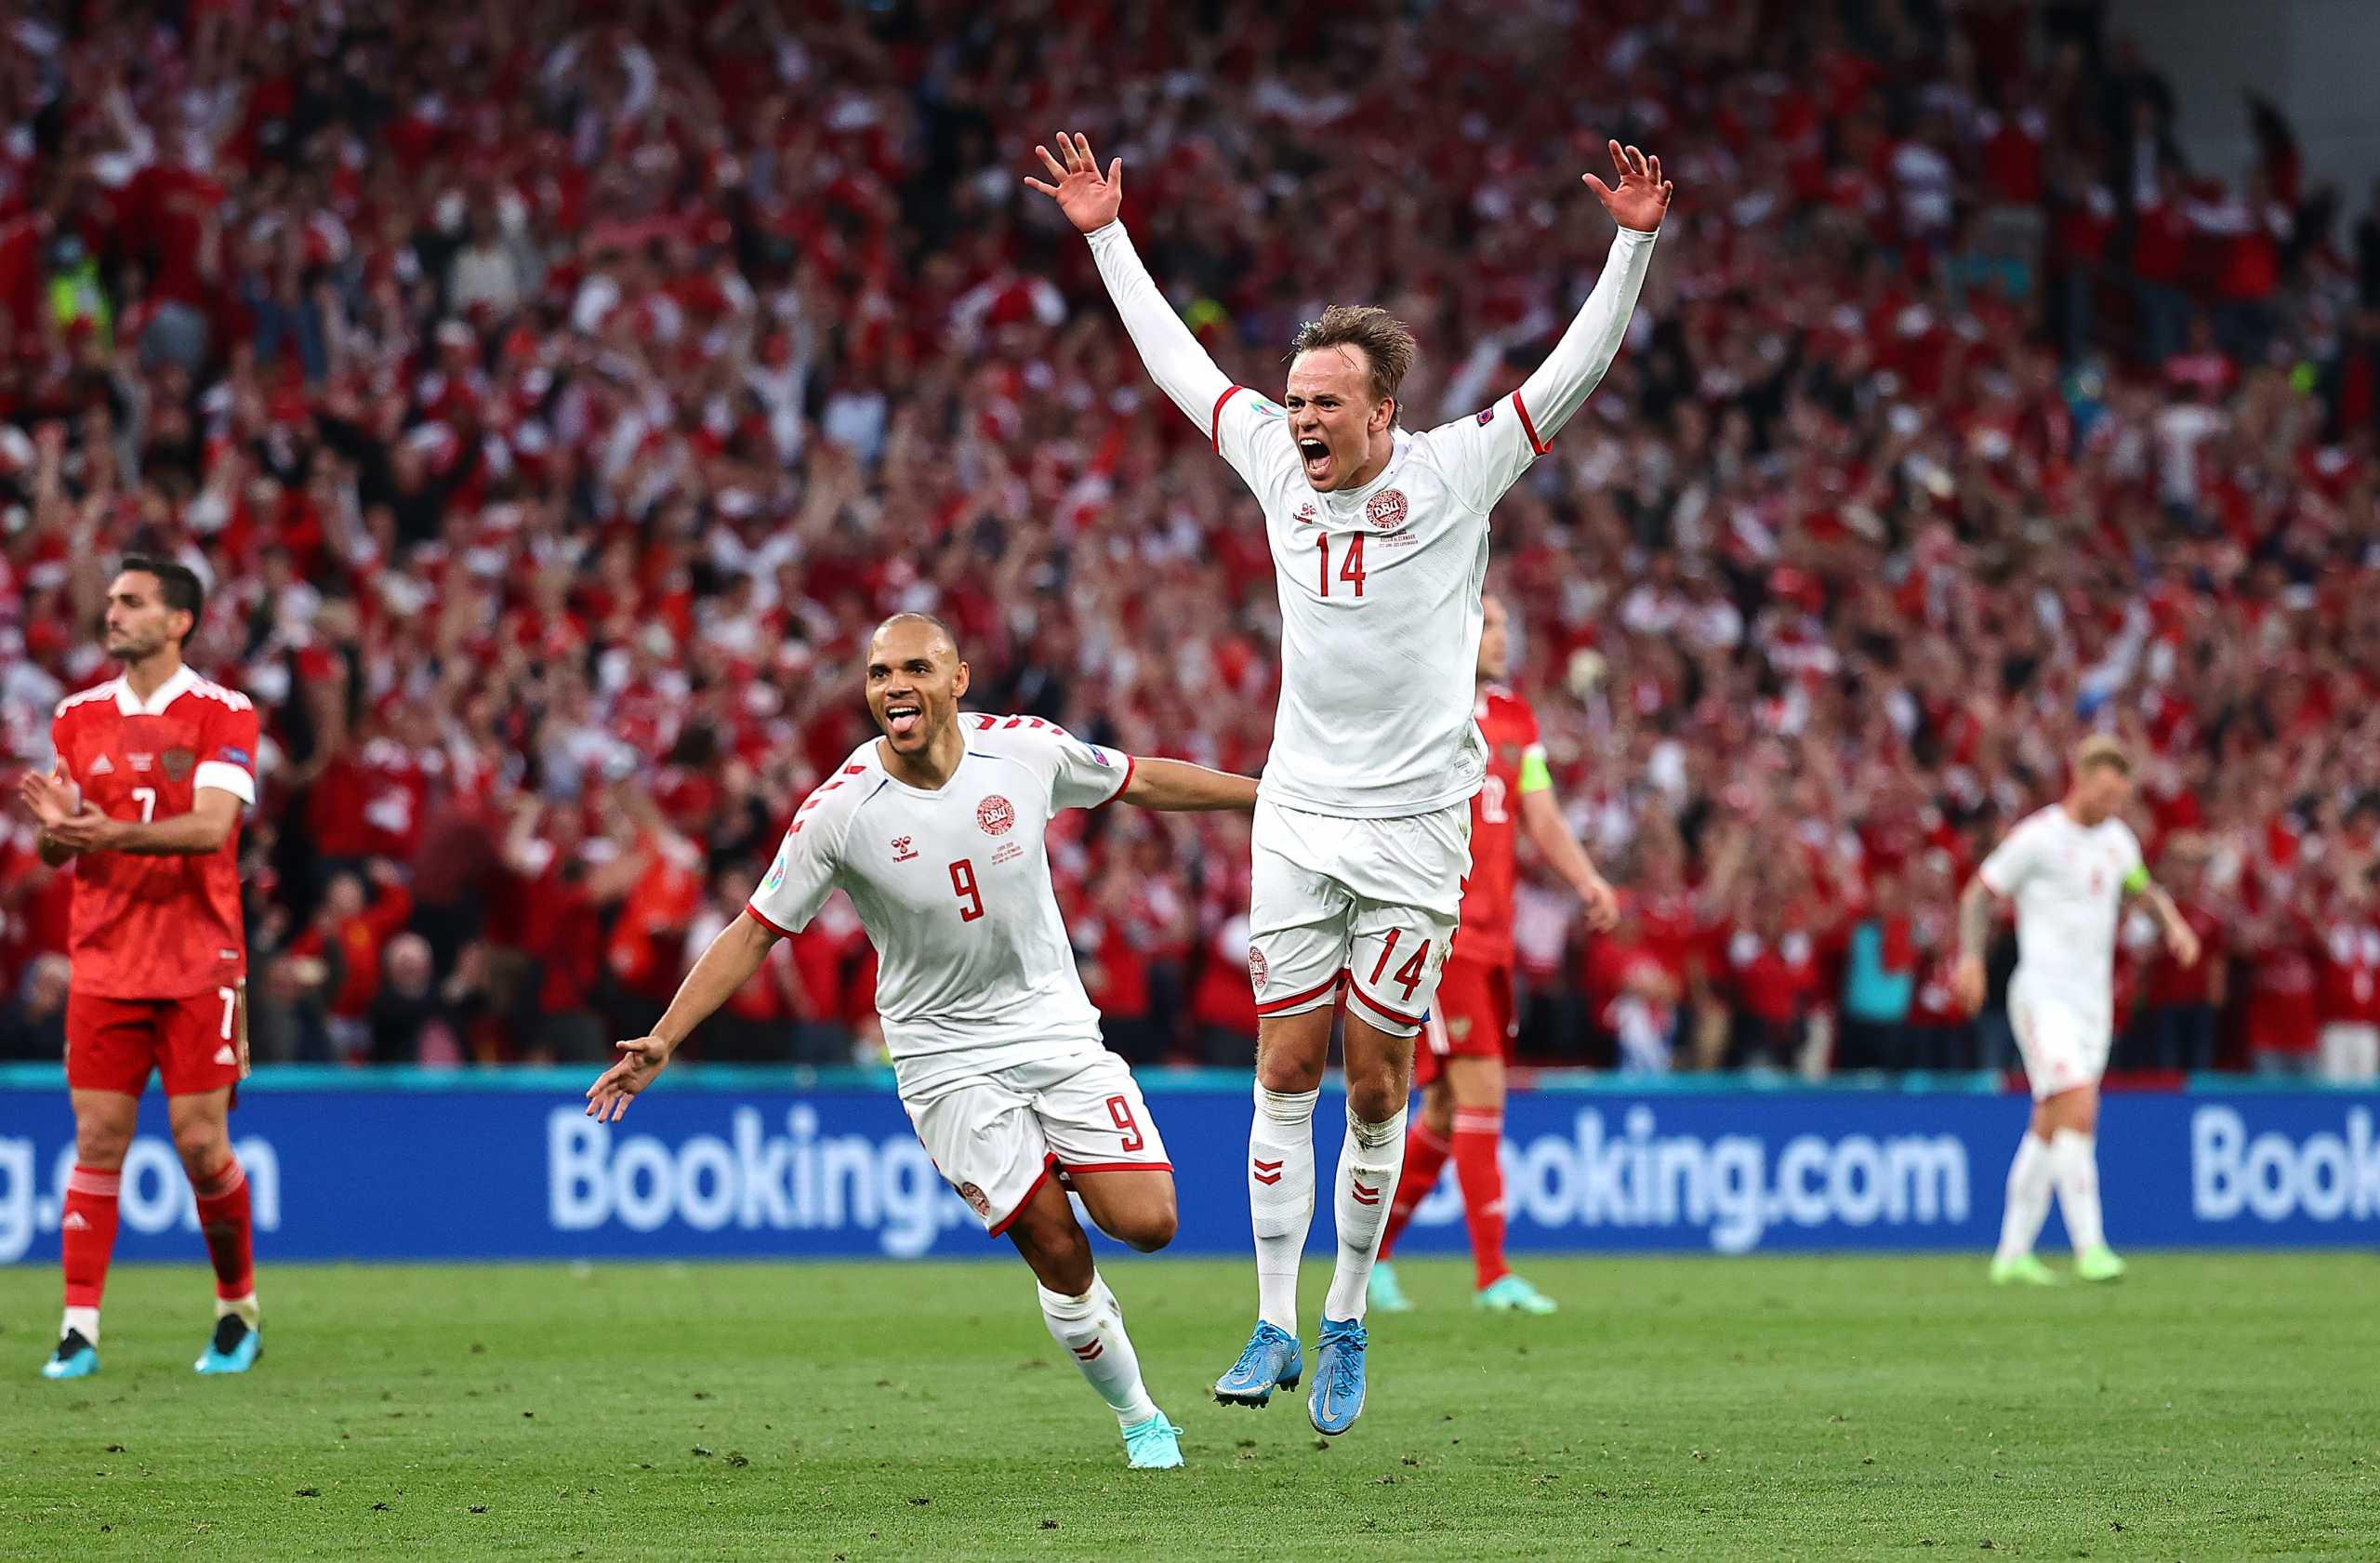 Euro 2020: Αδιανόητη «φωτοβολίδα» του Ντάμσγκααρντ βάζει την Δανία στο «κόλπο» της πρόκρισης